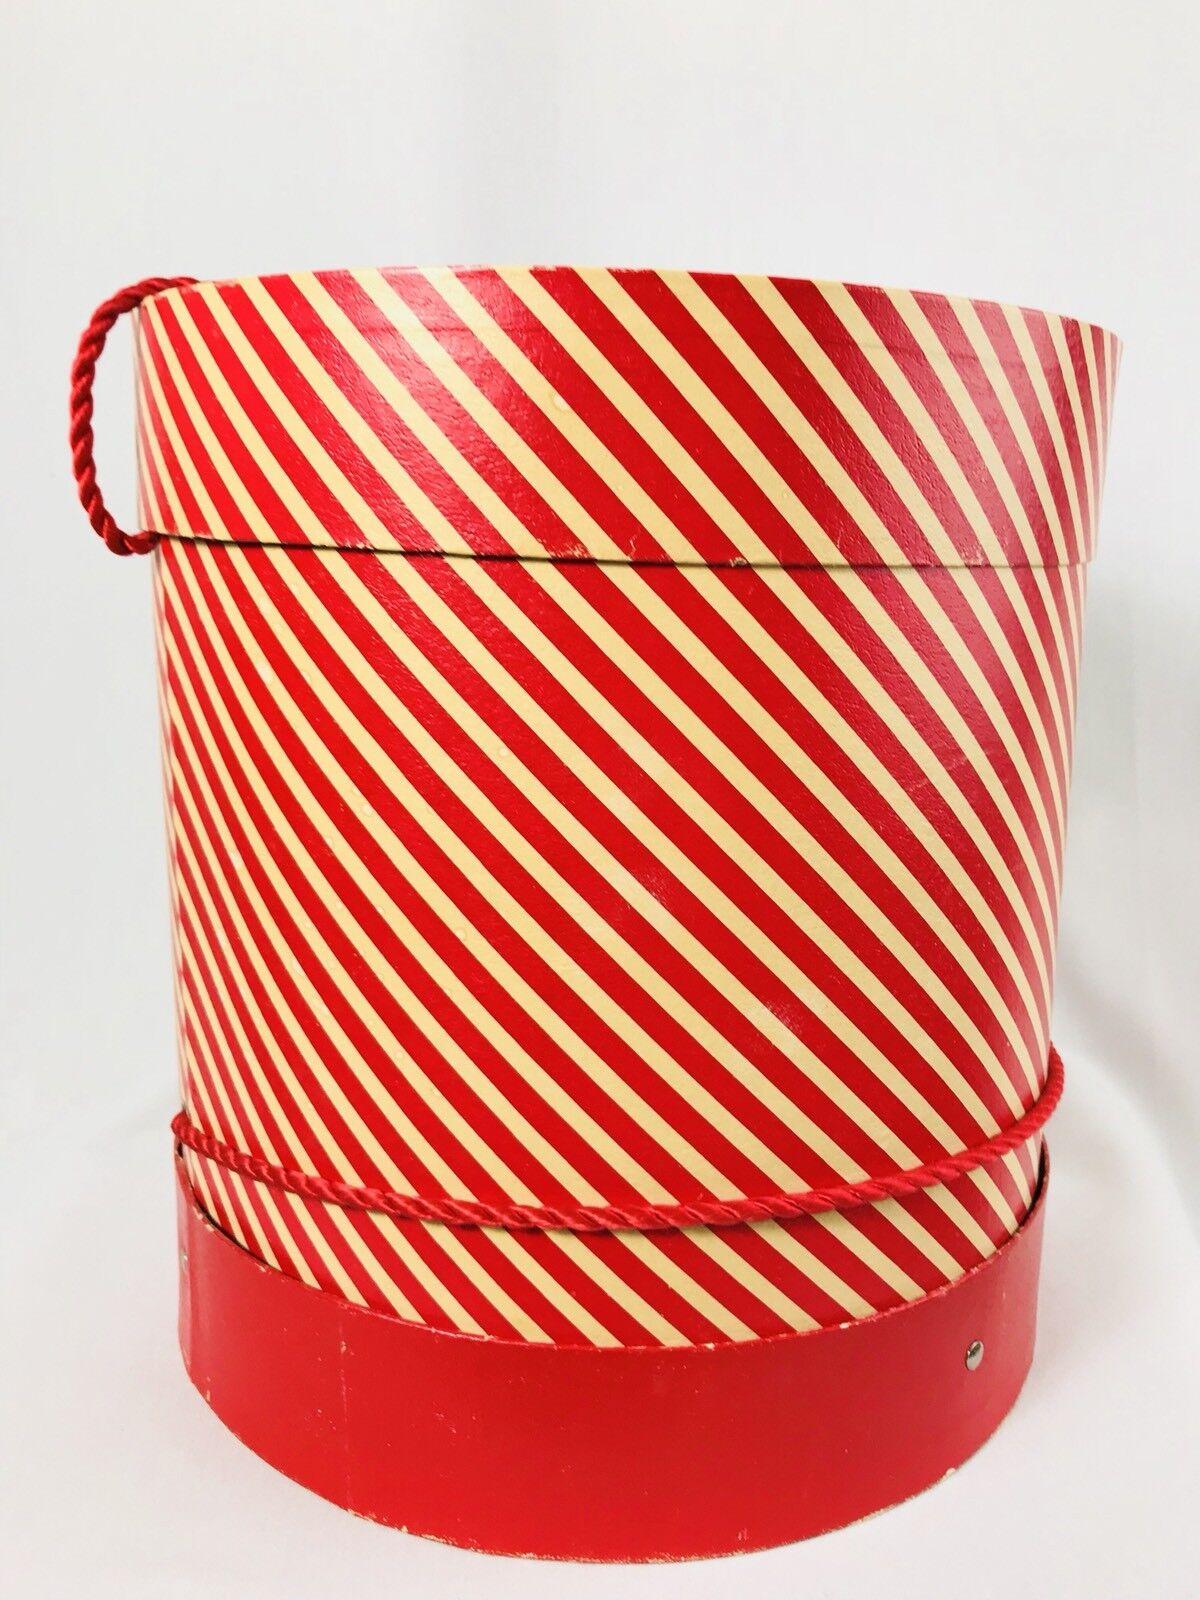 Vintage Antique Hat Box rot Weiß striped Film Prop Tall